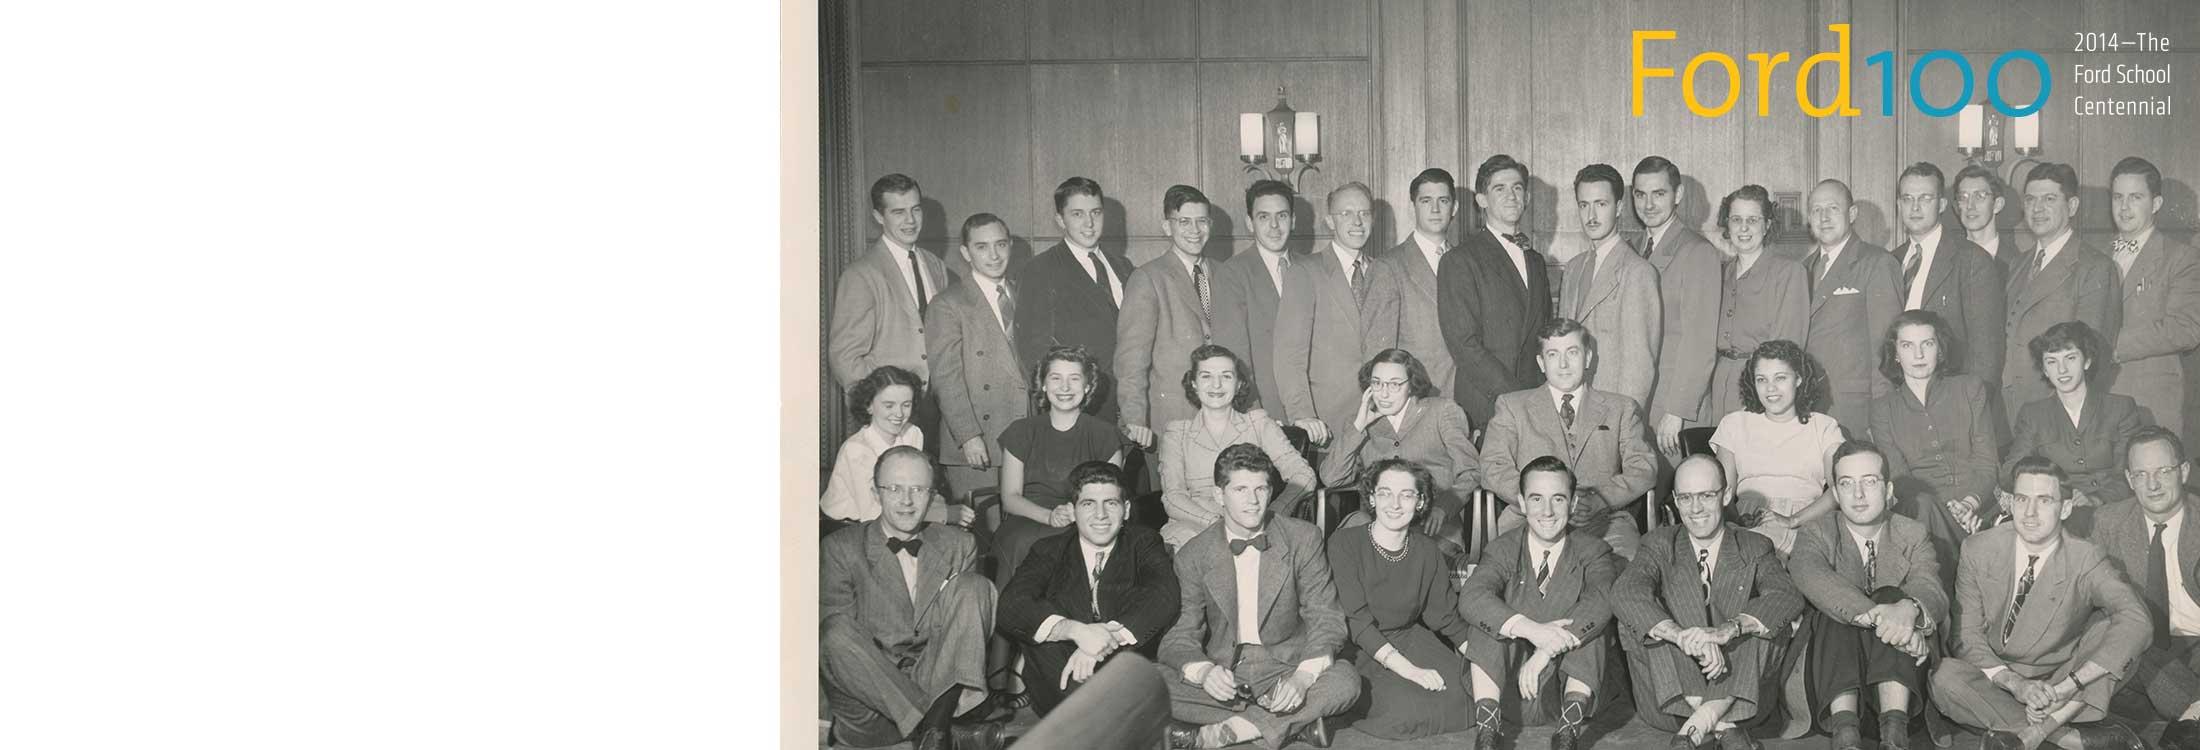 2014:The Ford School Centennial